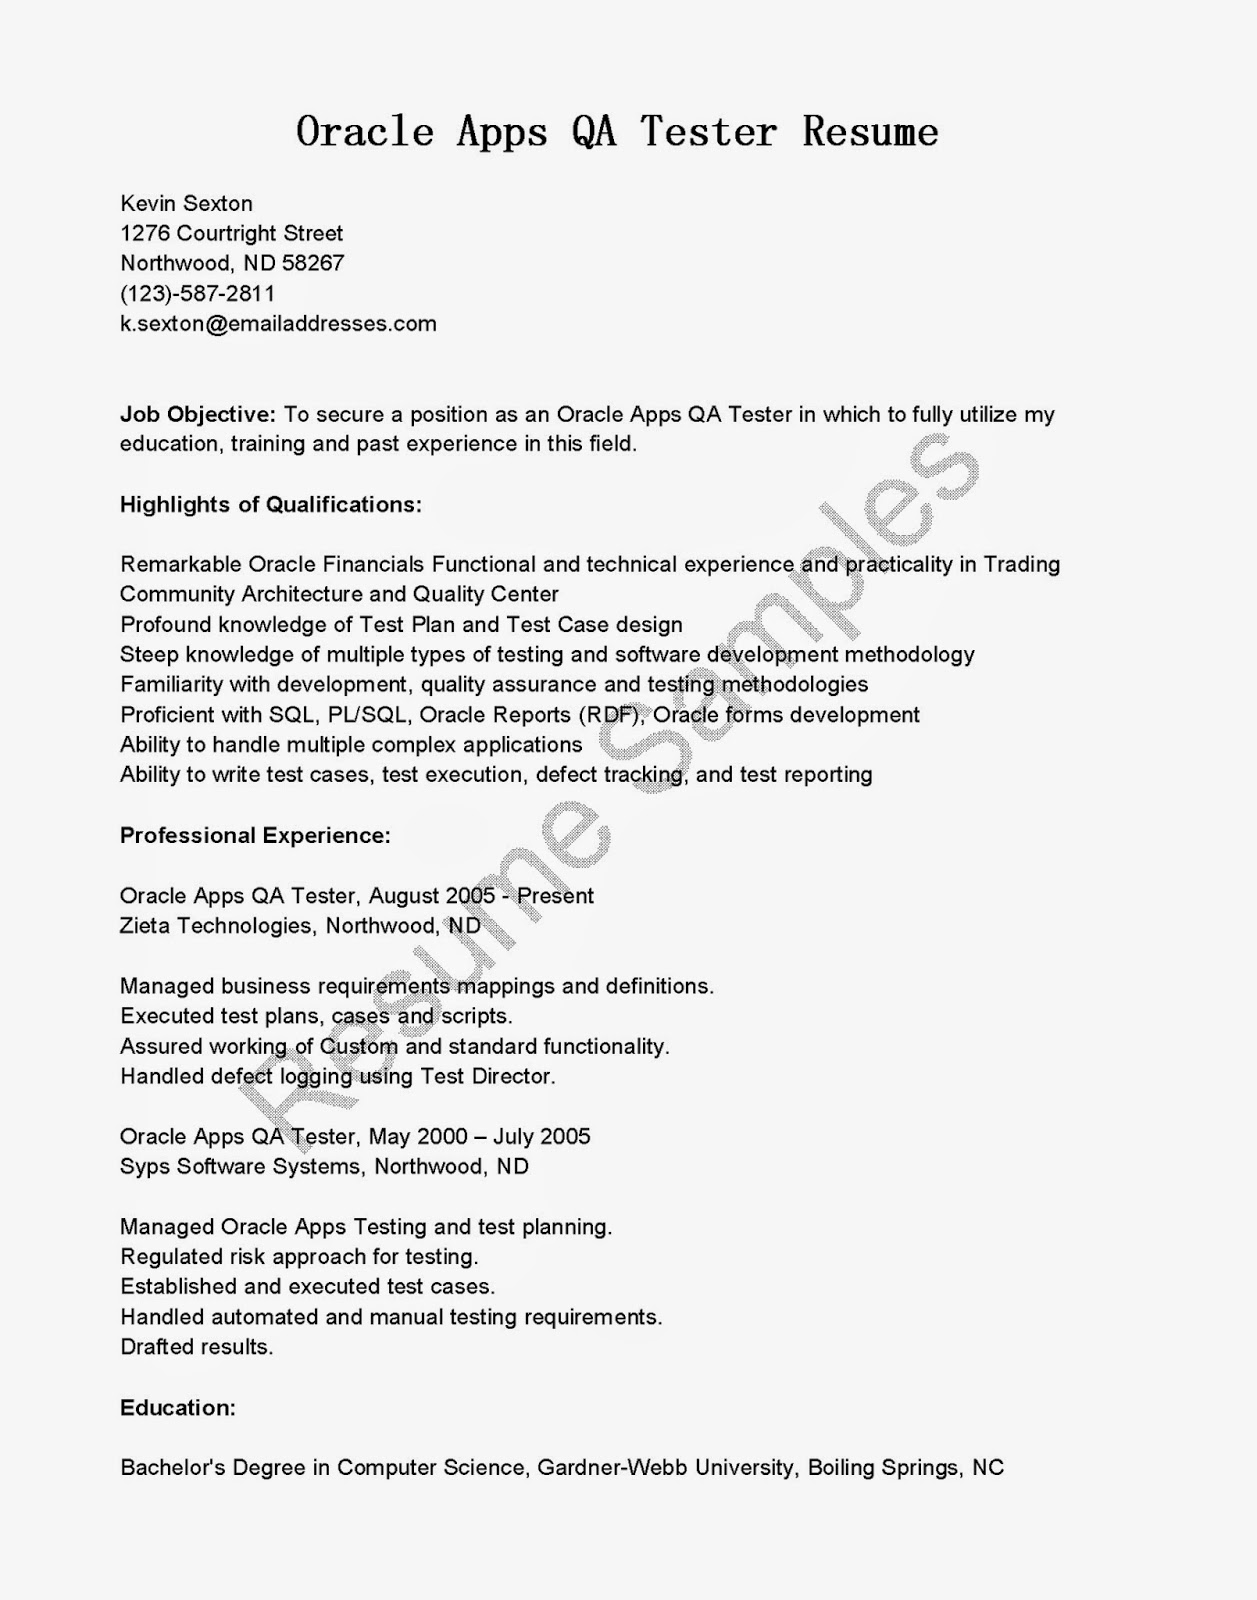 Resume Samples Oracle Apps Qa Tester Sample